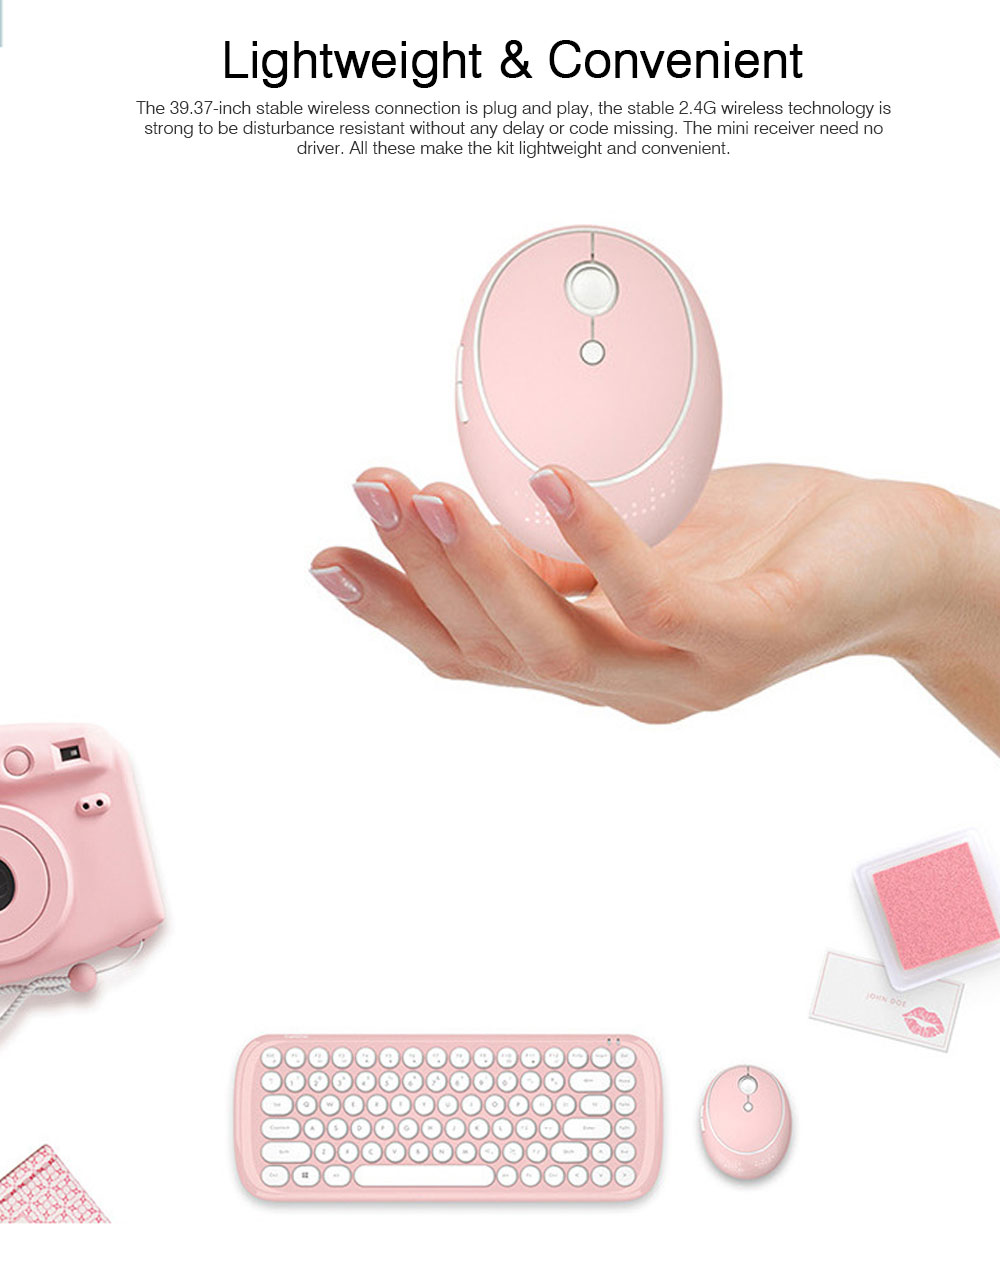 Mechanical Keyboard Kit for Computer Game Mini Keyboard Kit Mini Mouse Kit for Laptop Wireless Keyboard & Mouse Kit  3